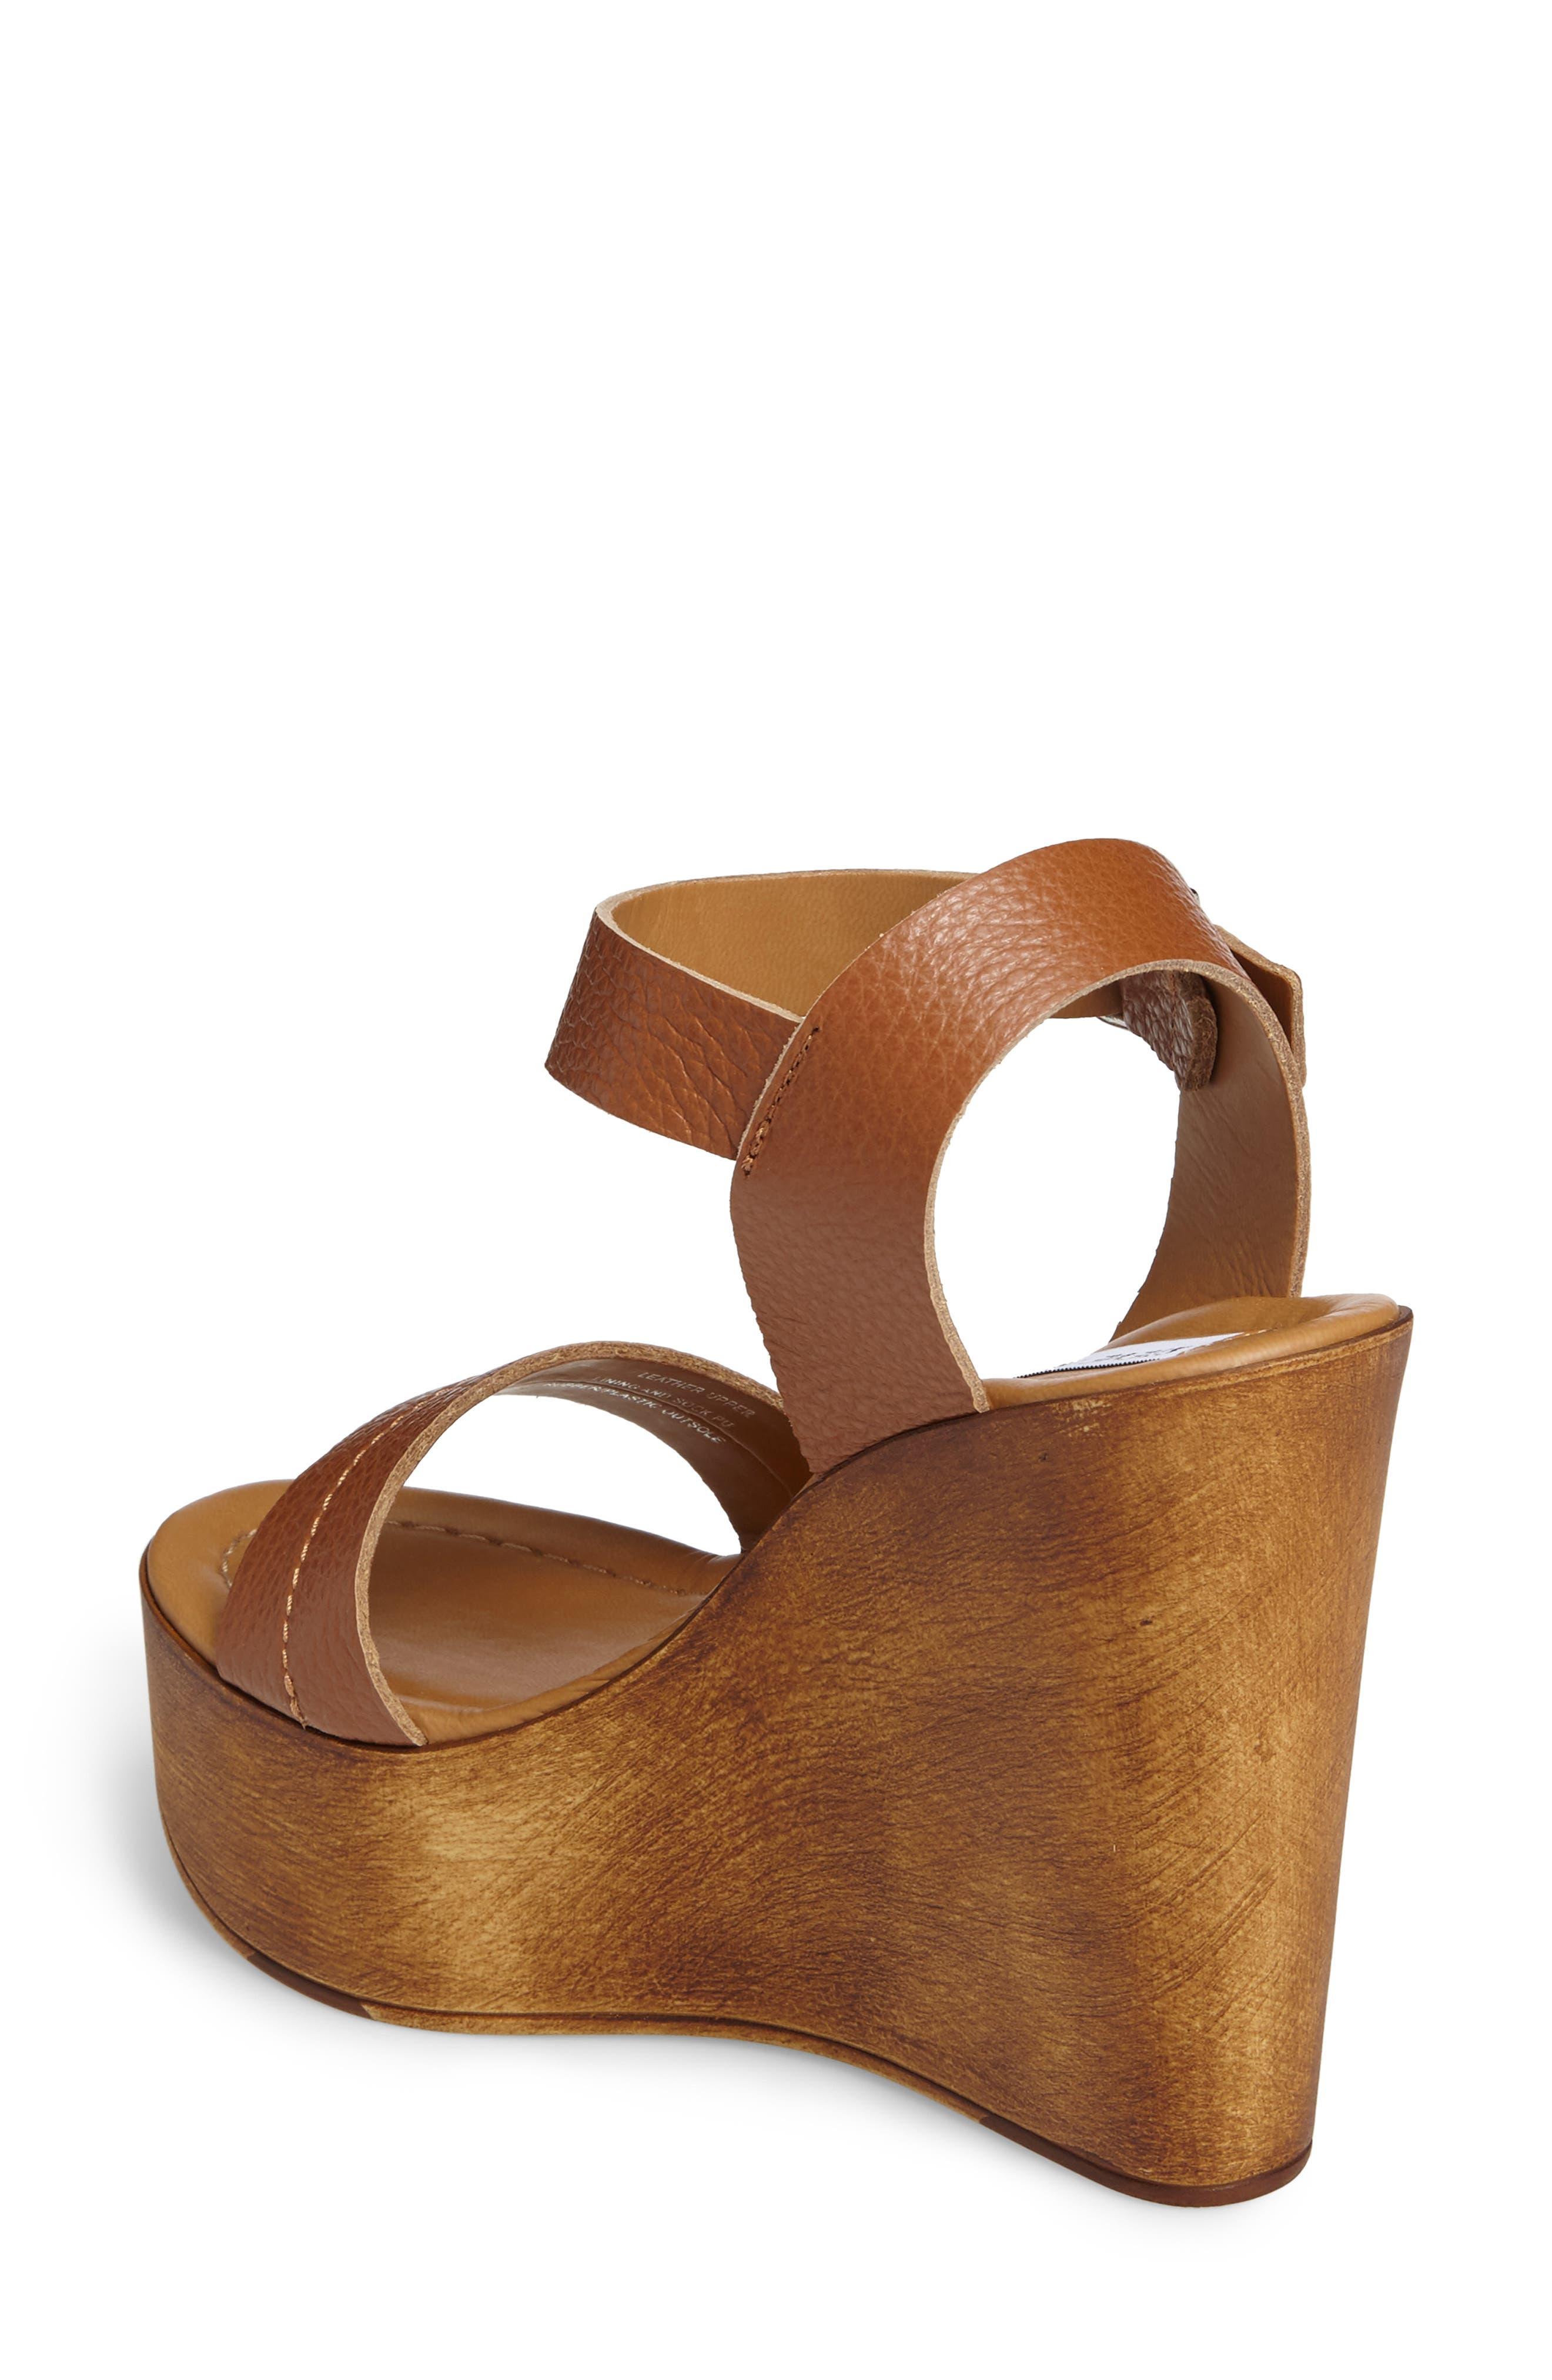 Belma Wedge Sandal,                             Alternate thumbnail 2, color,                             Tan Leather